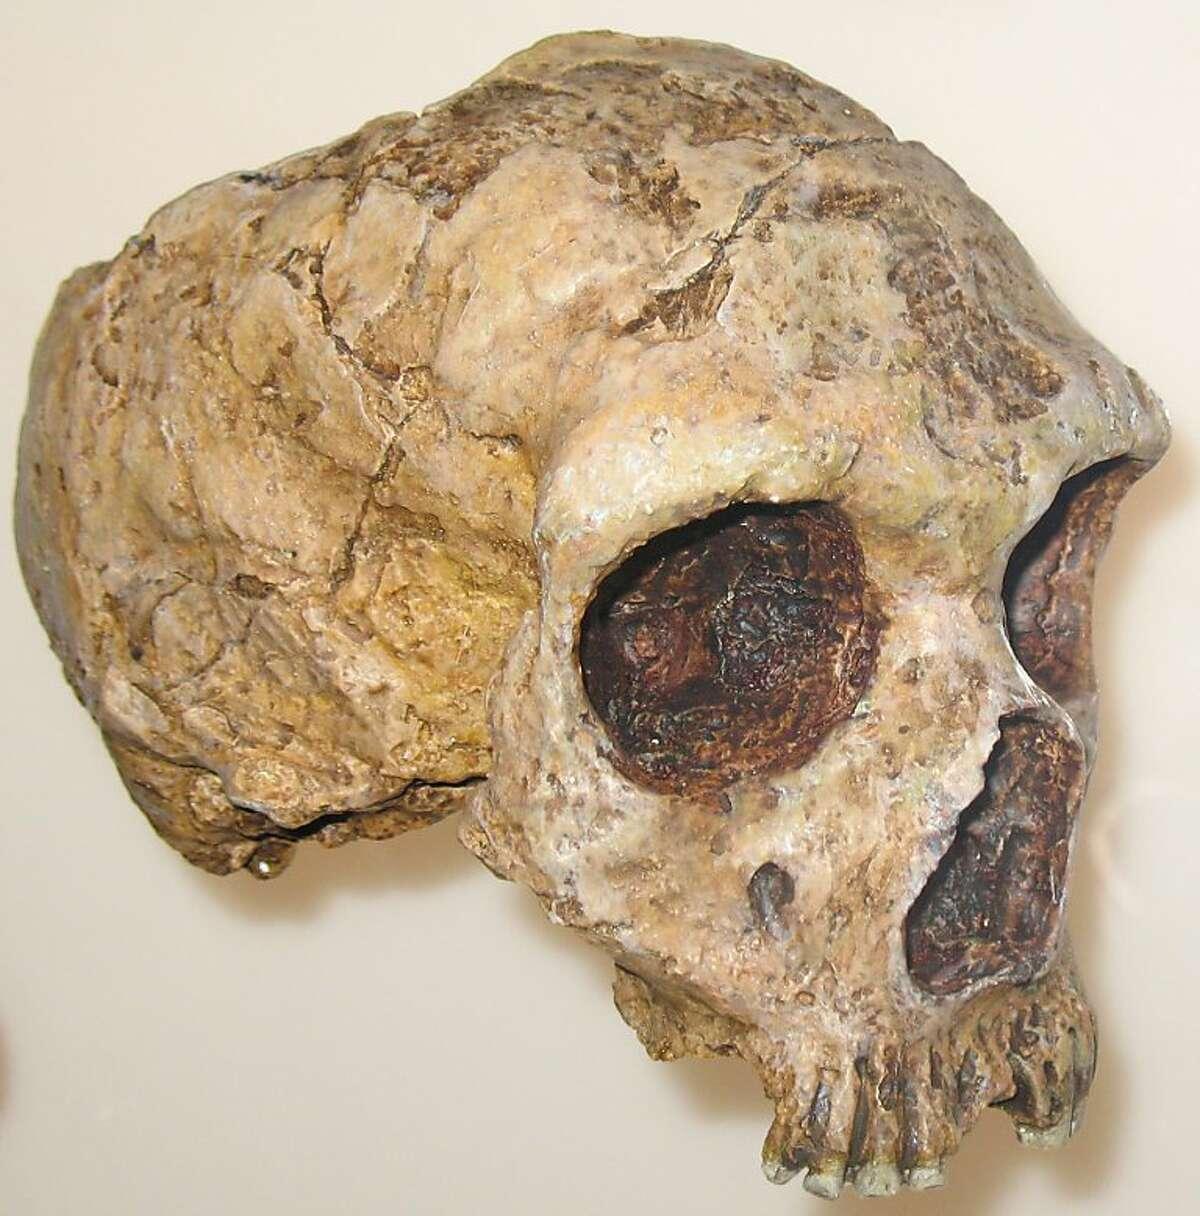 Skull of a Homo neanderthalensis (30.000 - 50.000 years old)